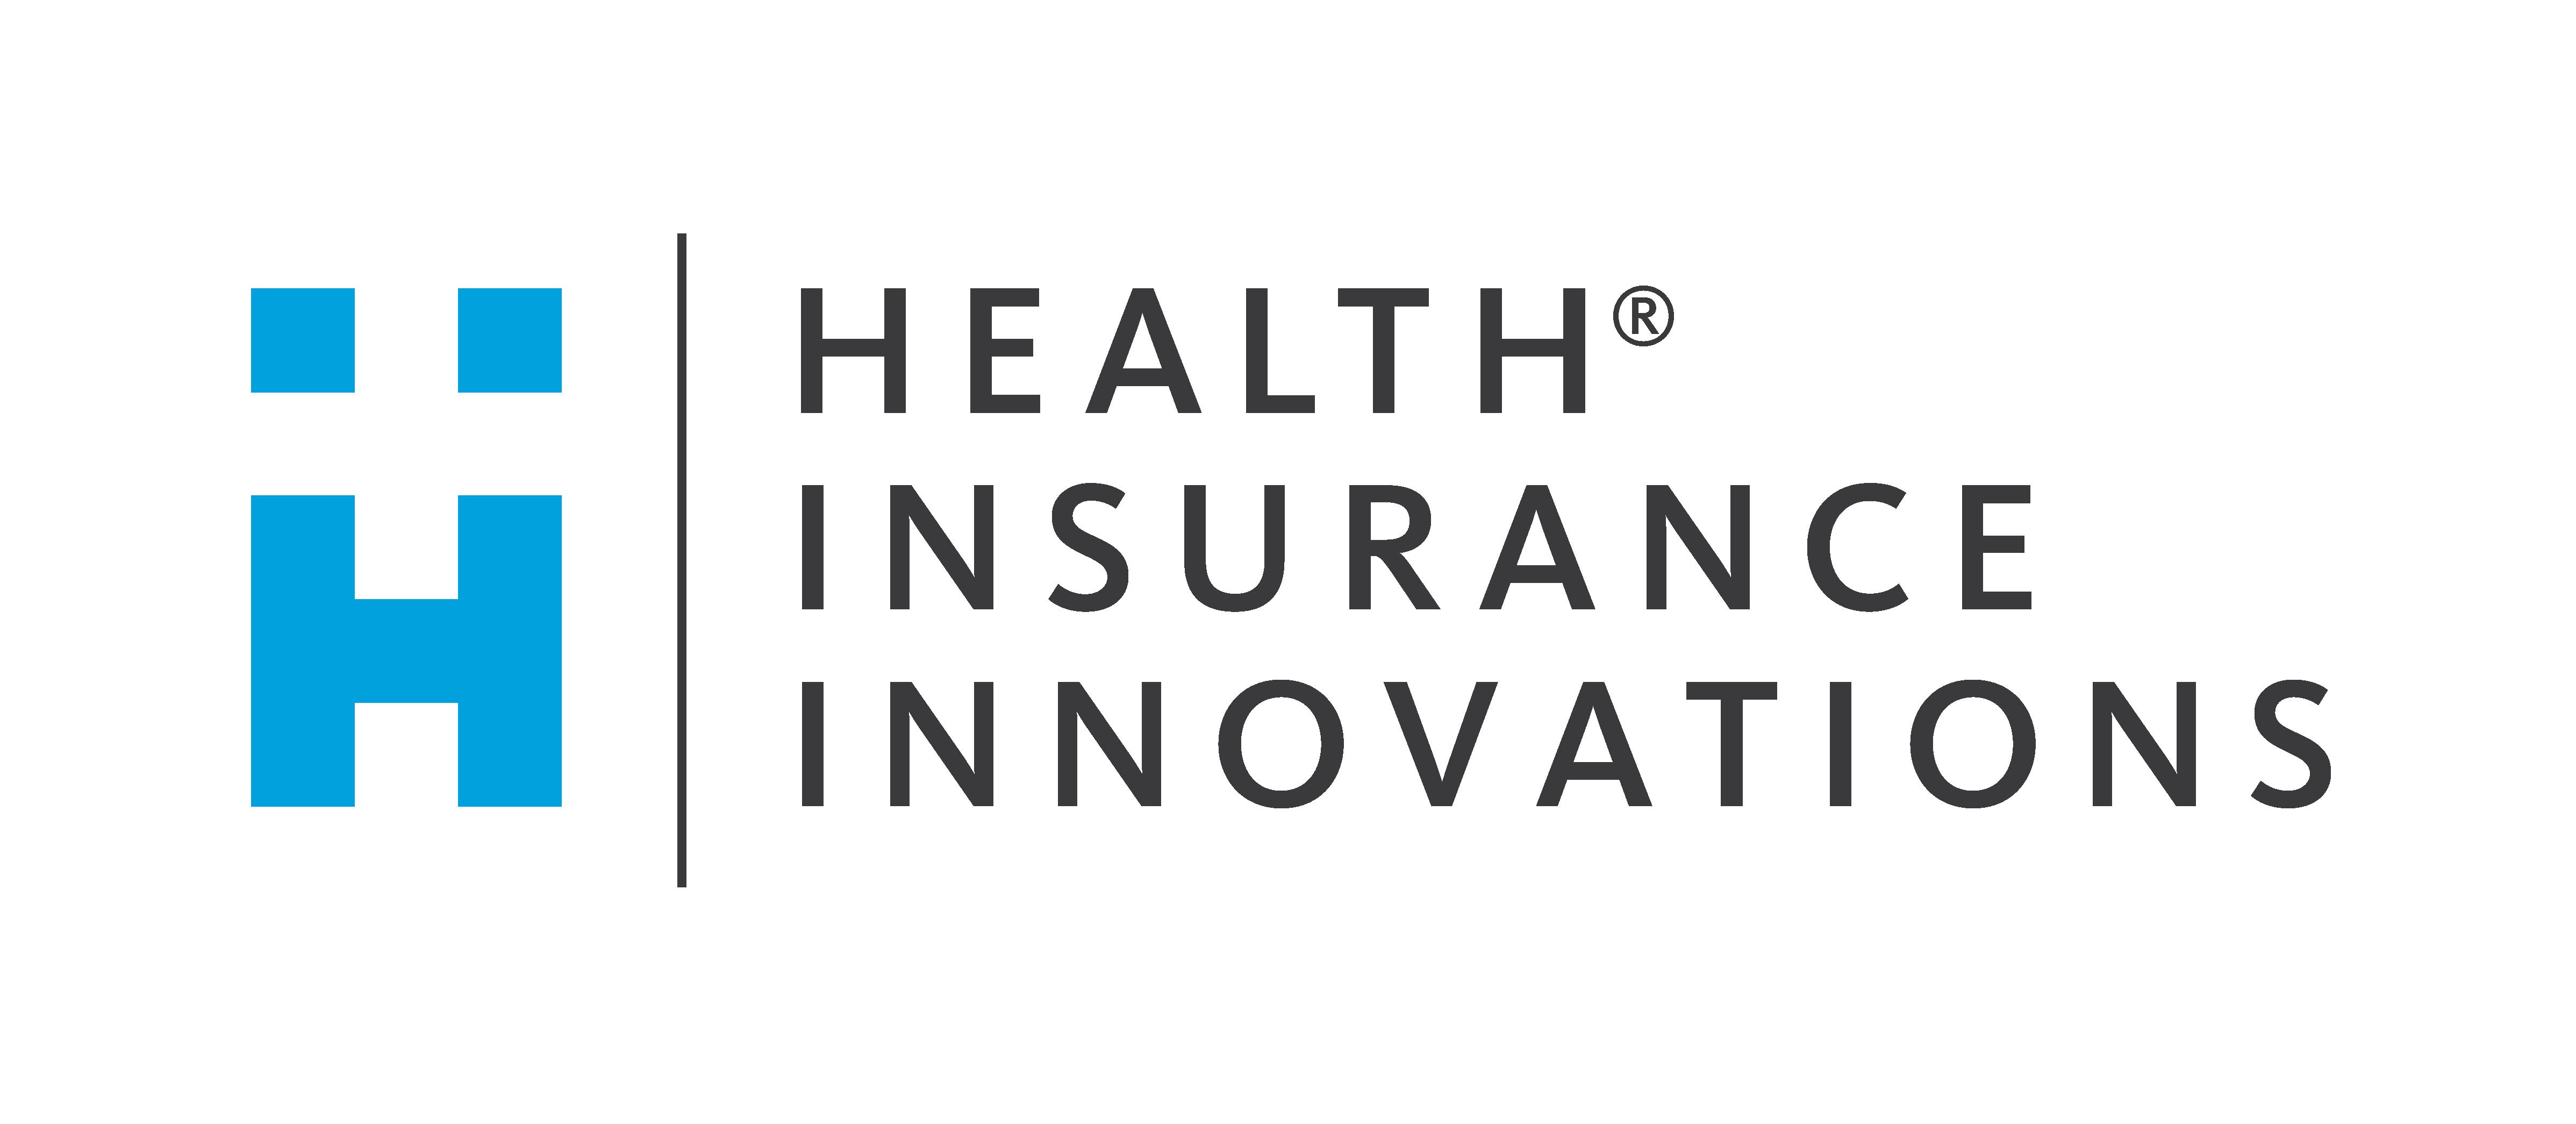 Health Insurance Innovations